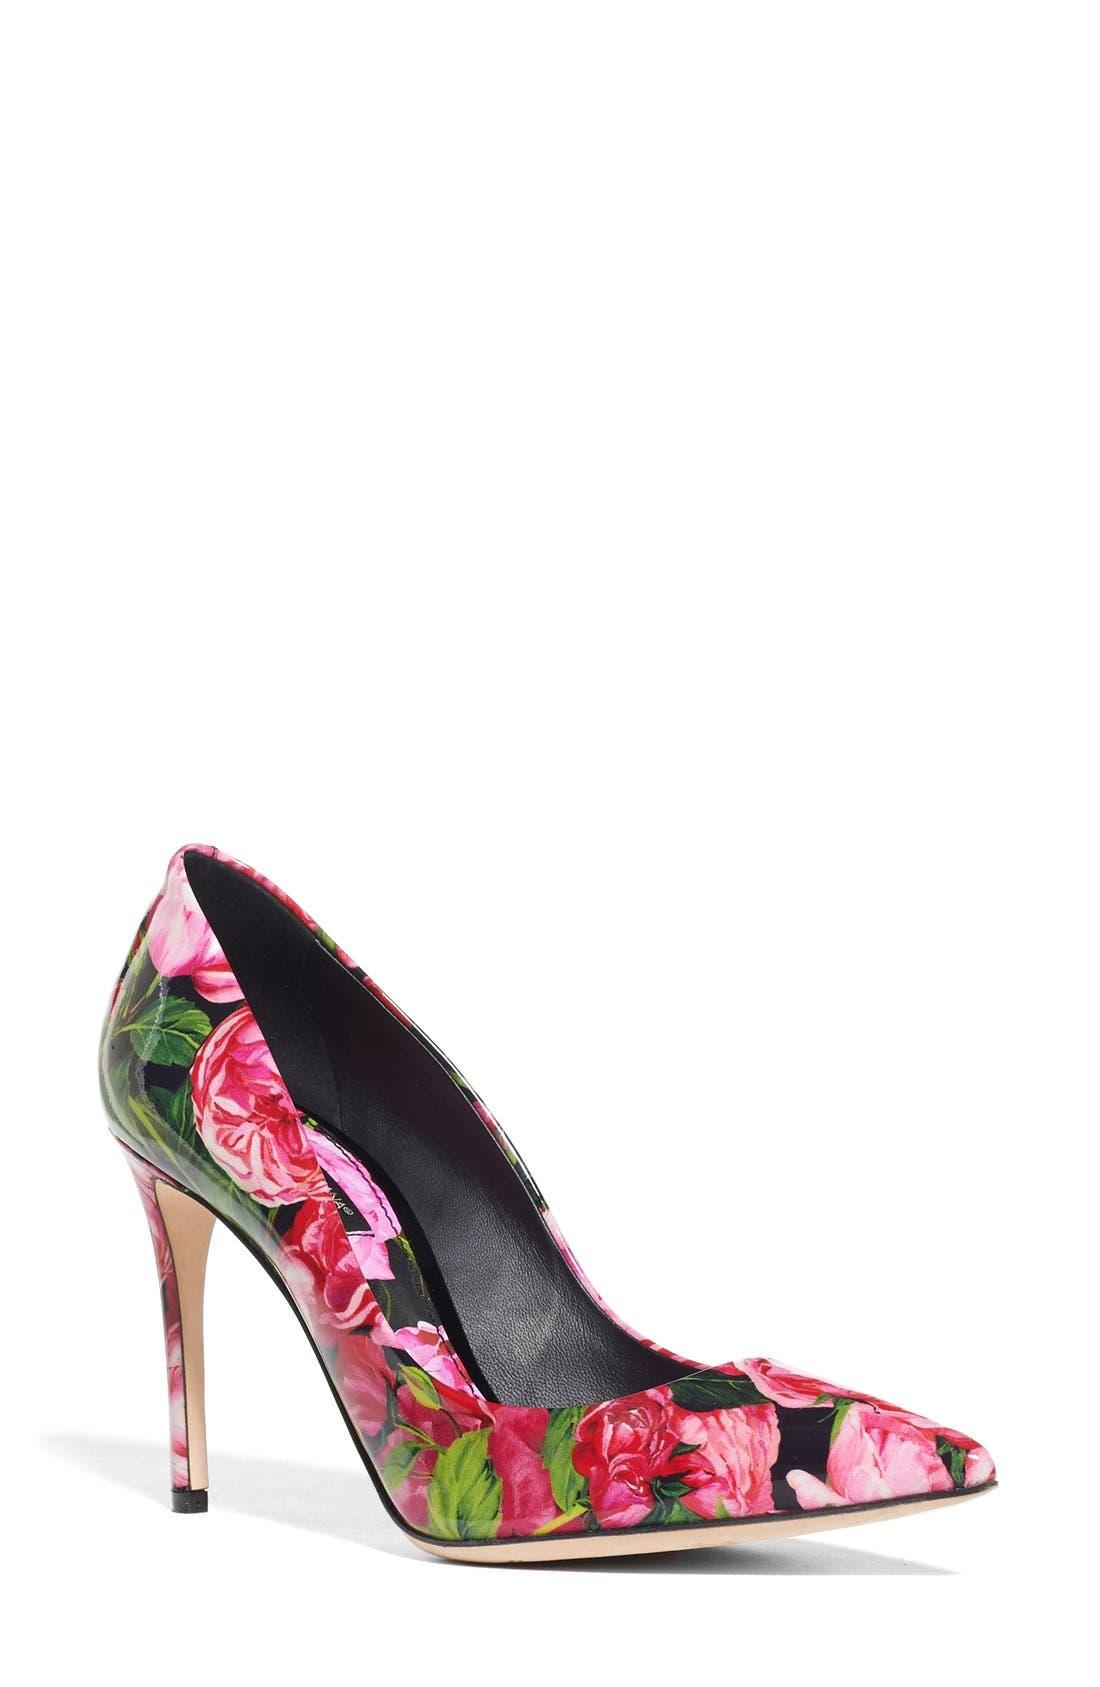 DOLCE&GABBANA Rose Print Pointy Toe Pump